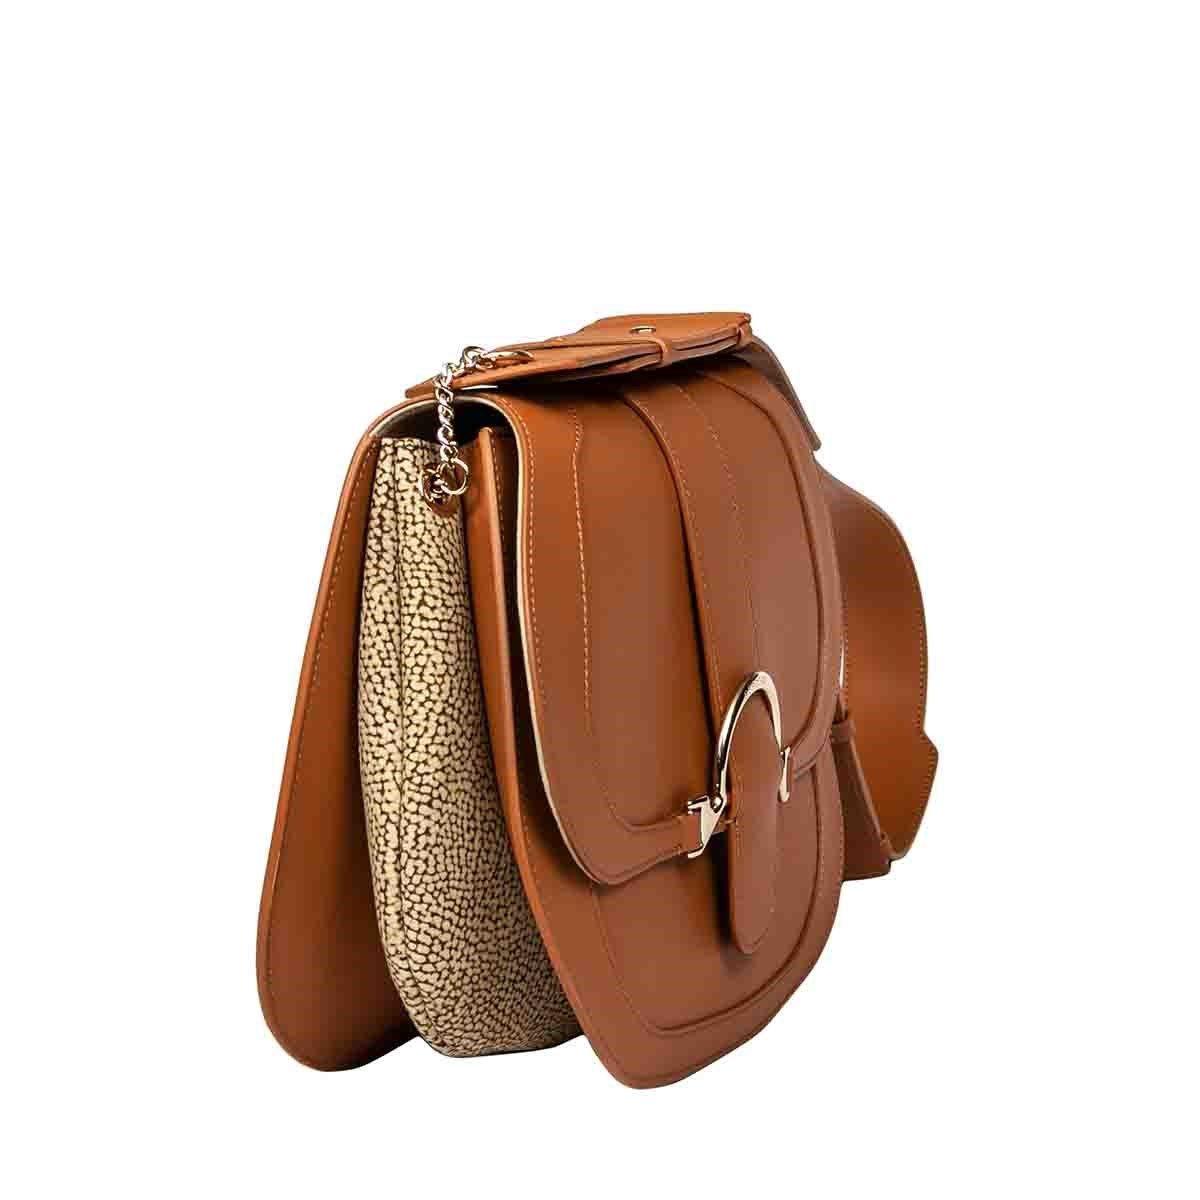 BORBONESE Leathers BORBONESE WOMEN'S BROWN LEATHER SHOULDER BAG